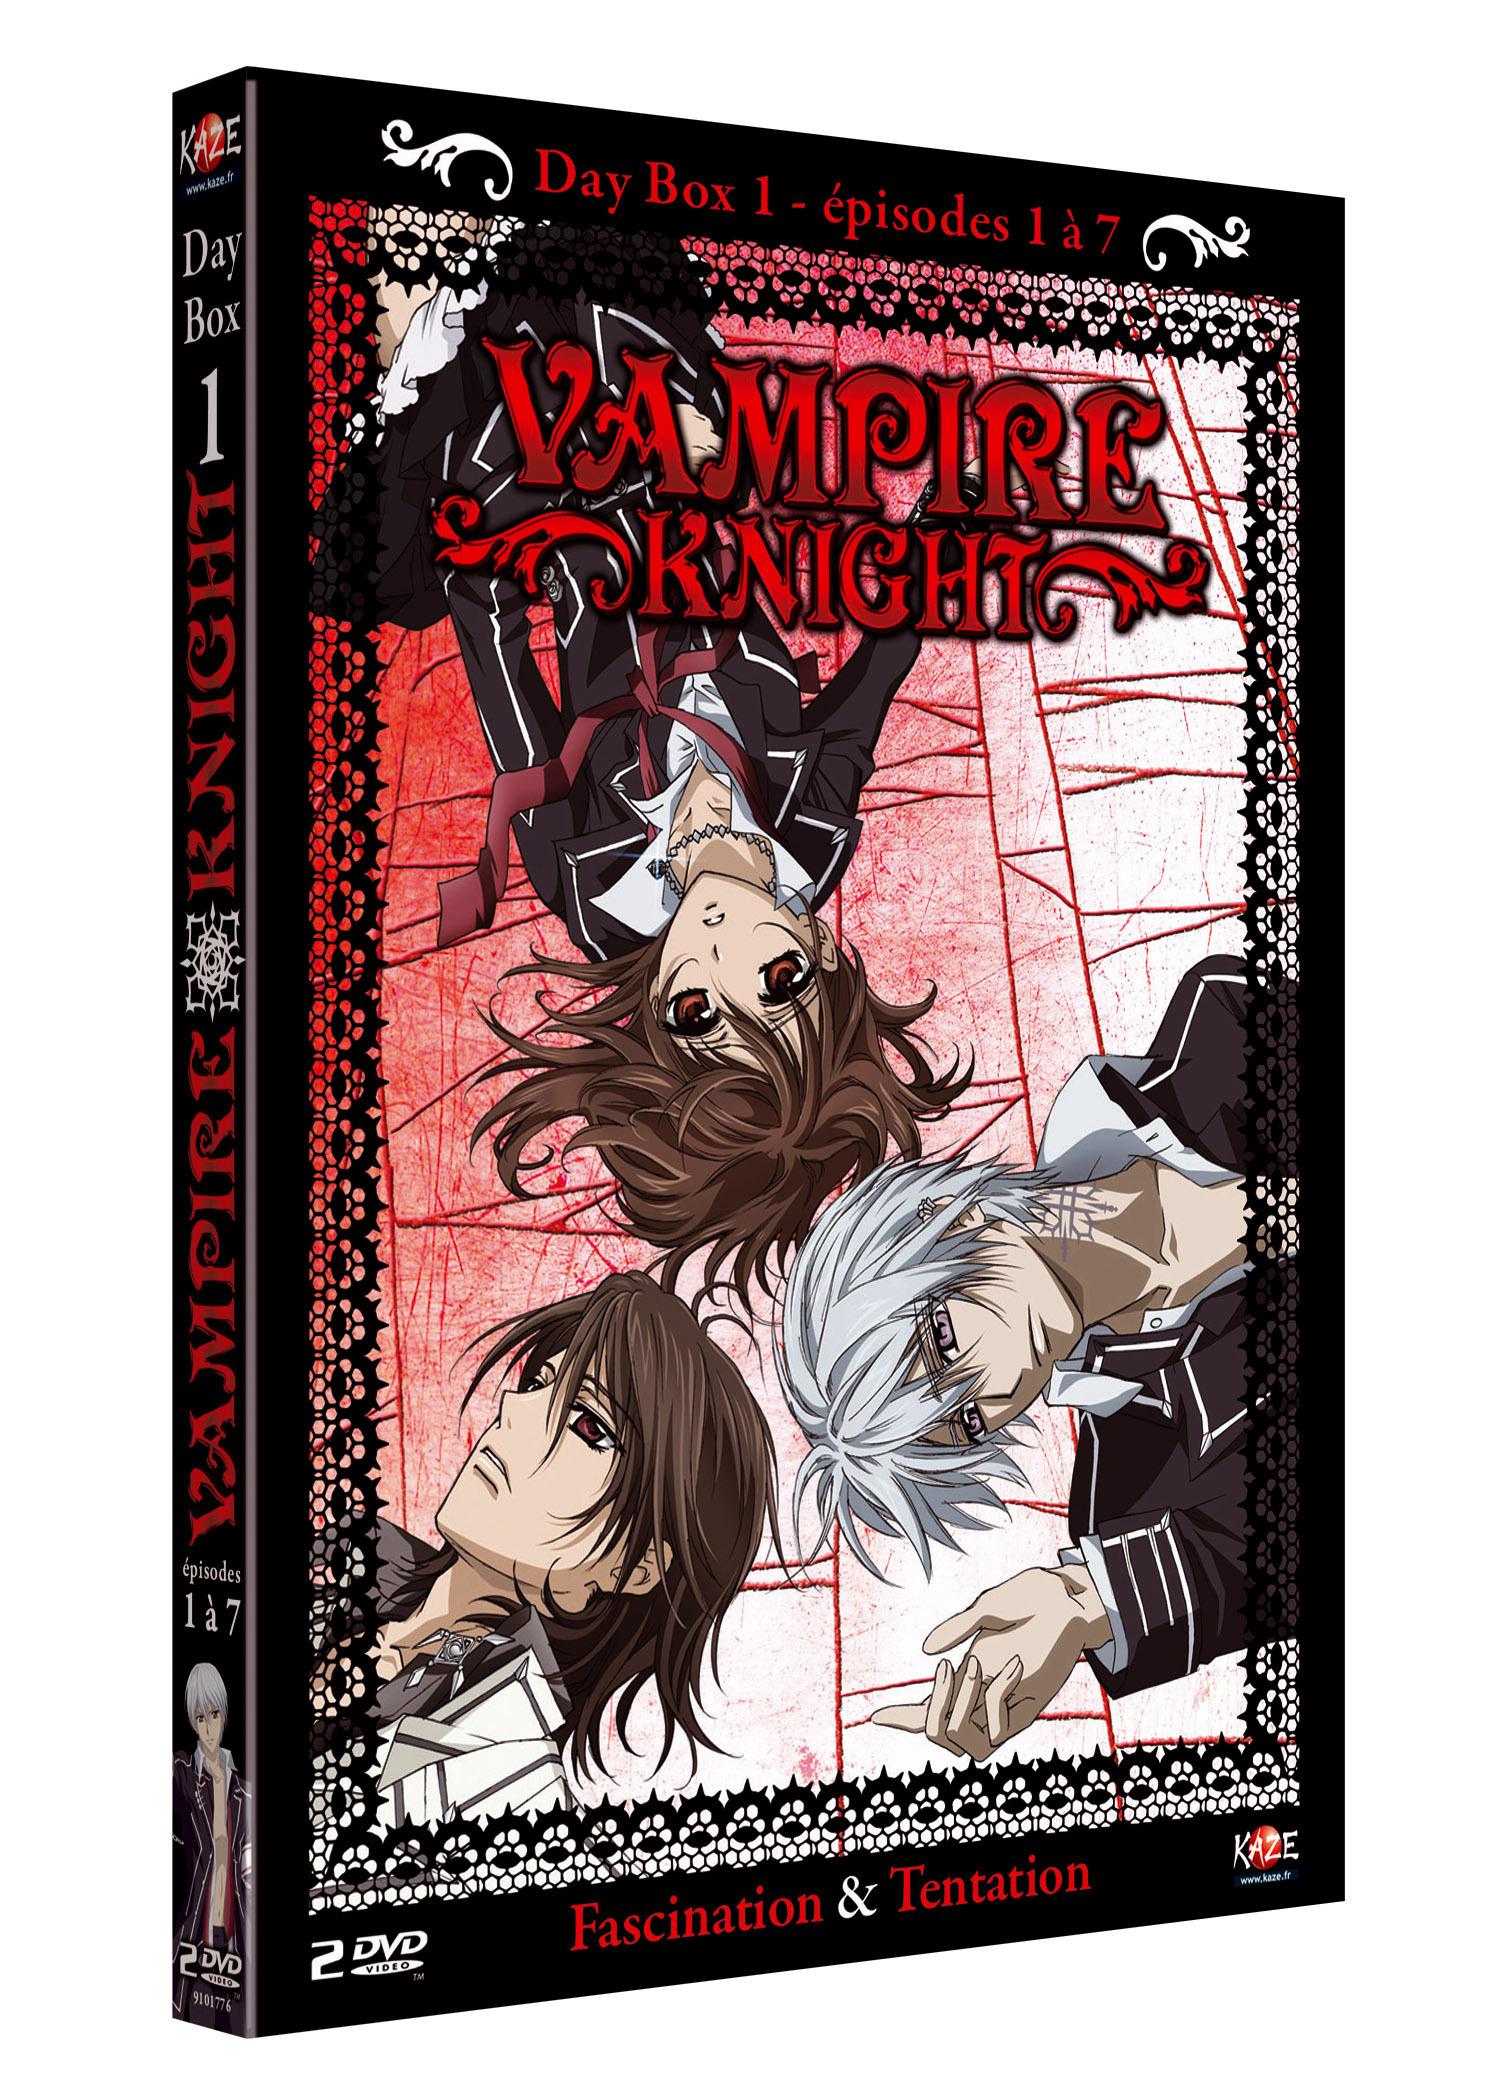 VAMPIRE KNIGHT SAISON 1 - PARTIE 1 - DVD